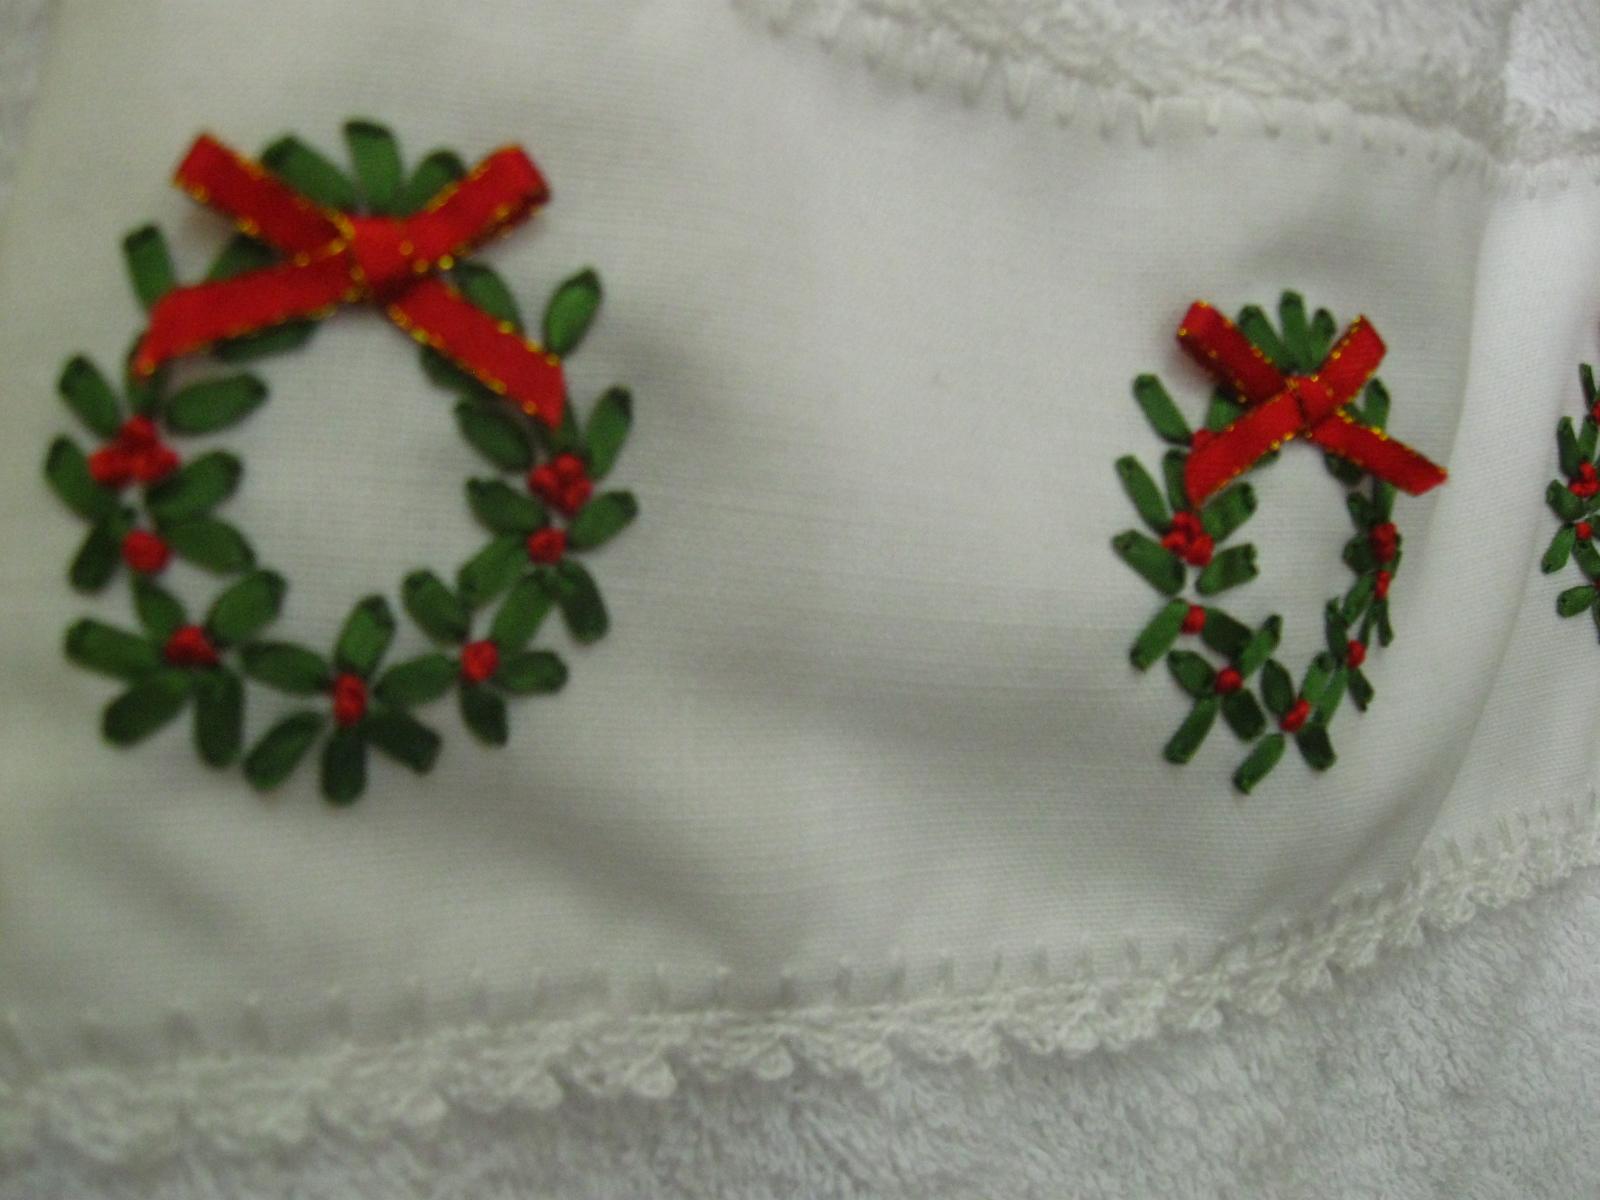 A Mano Toalla Blanca Con Coronas Bordadas En Cinta Y Tejido A Crochet -> Tapetes Para Sala Tejidos A Crochet